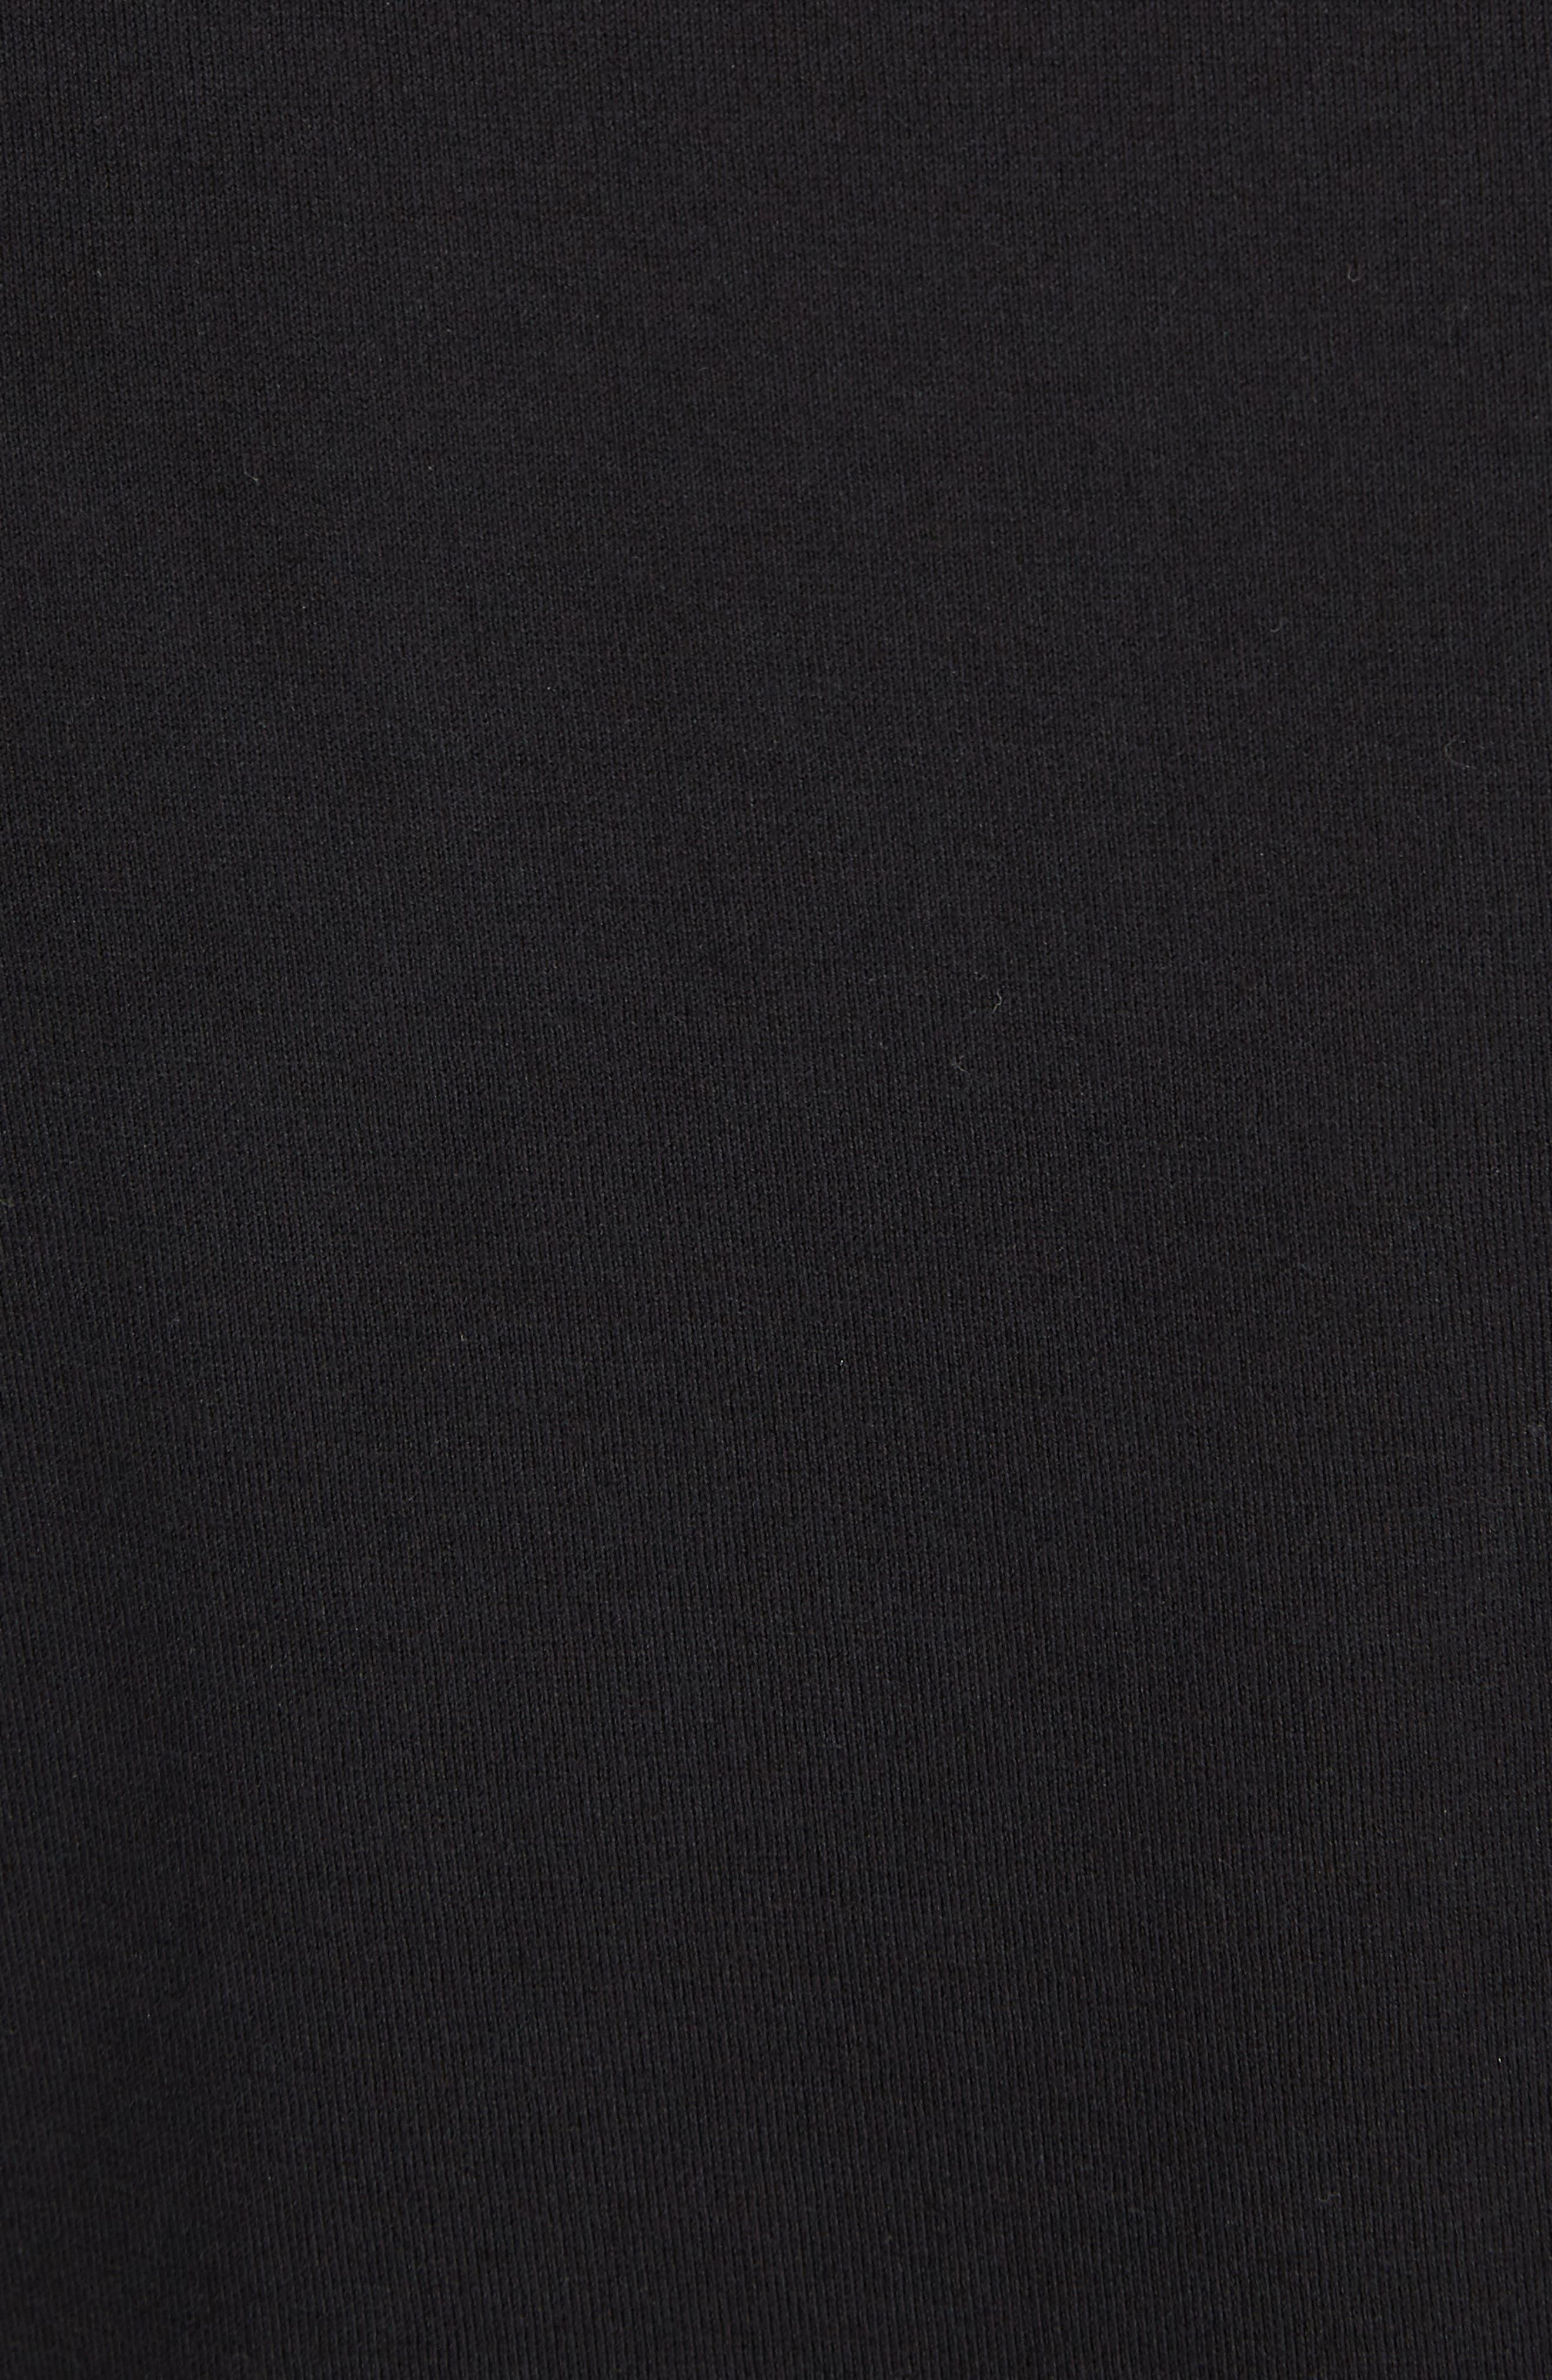 Jewel Print Crewneck T-Shirt,                             Alternate thumbnail 5, color,                             Black